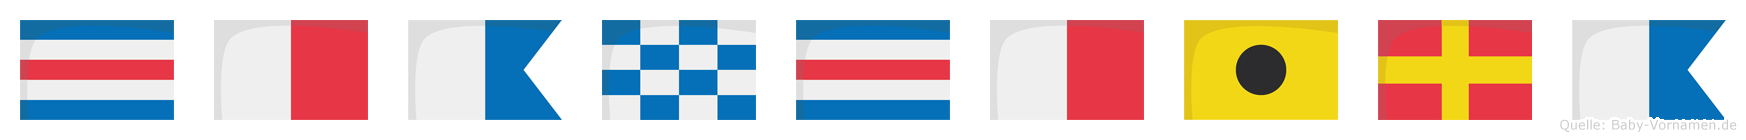 Chanchira im Flaggenalphabet